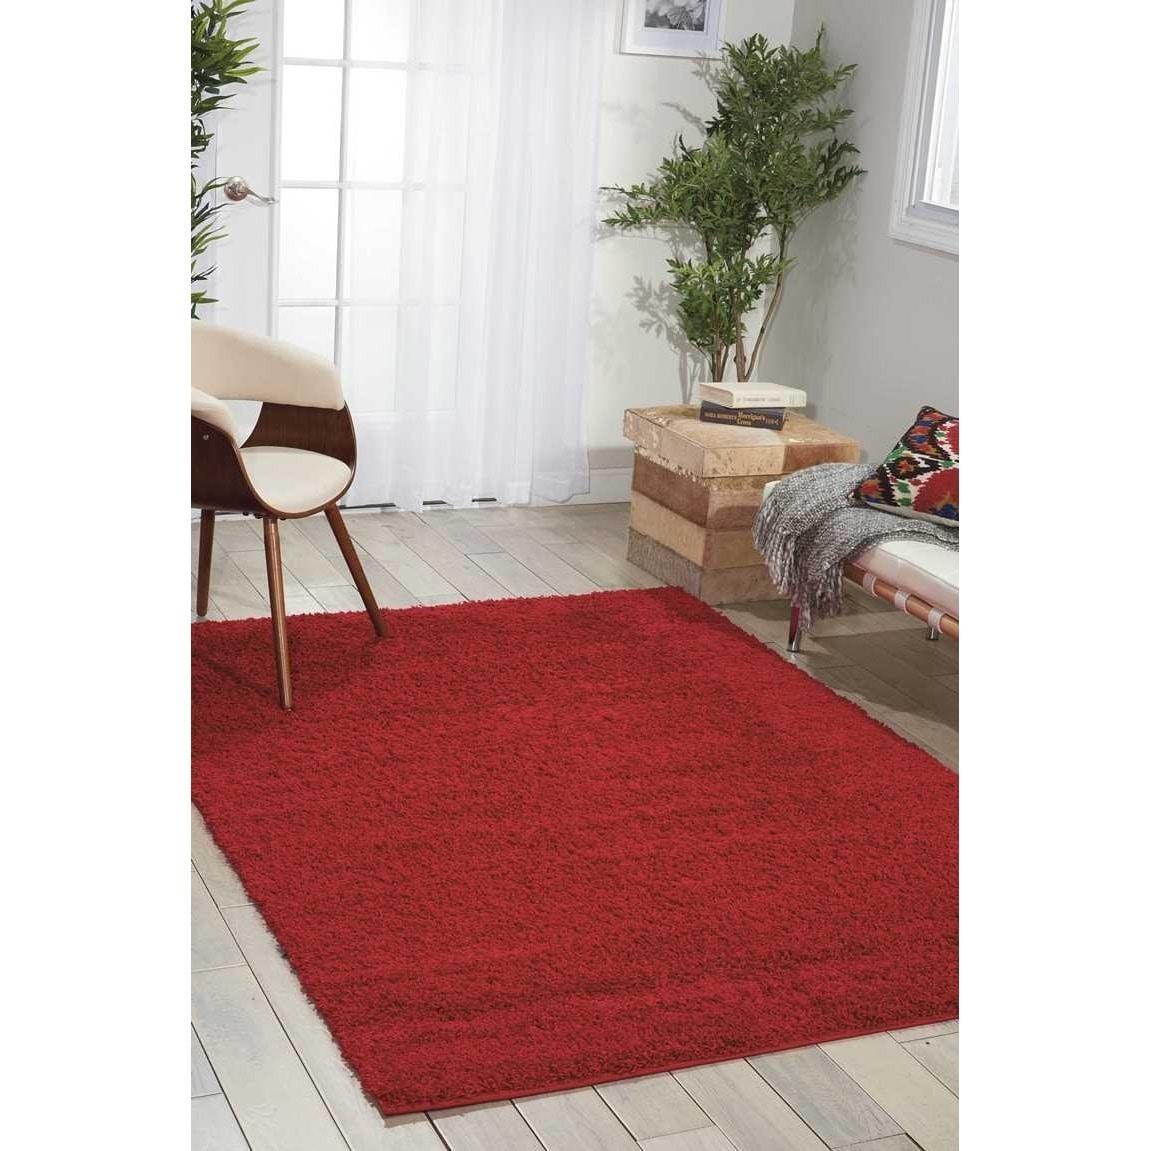 nourison bonita red shag area rug 8u00272 x